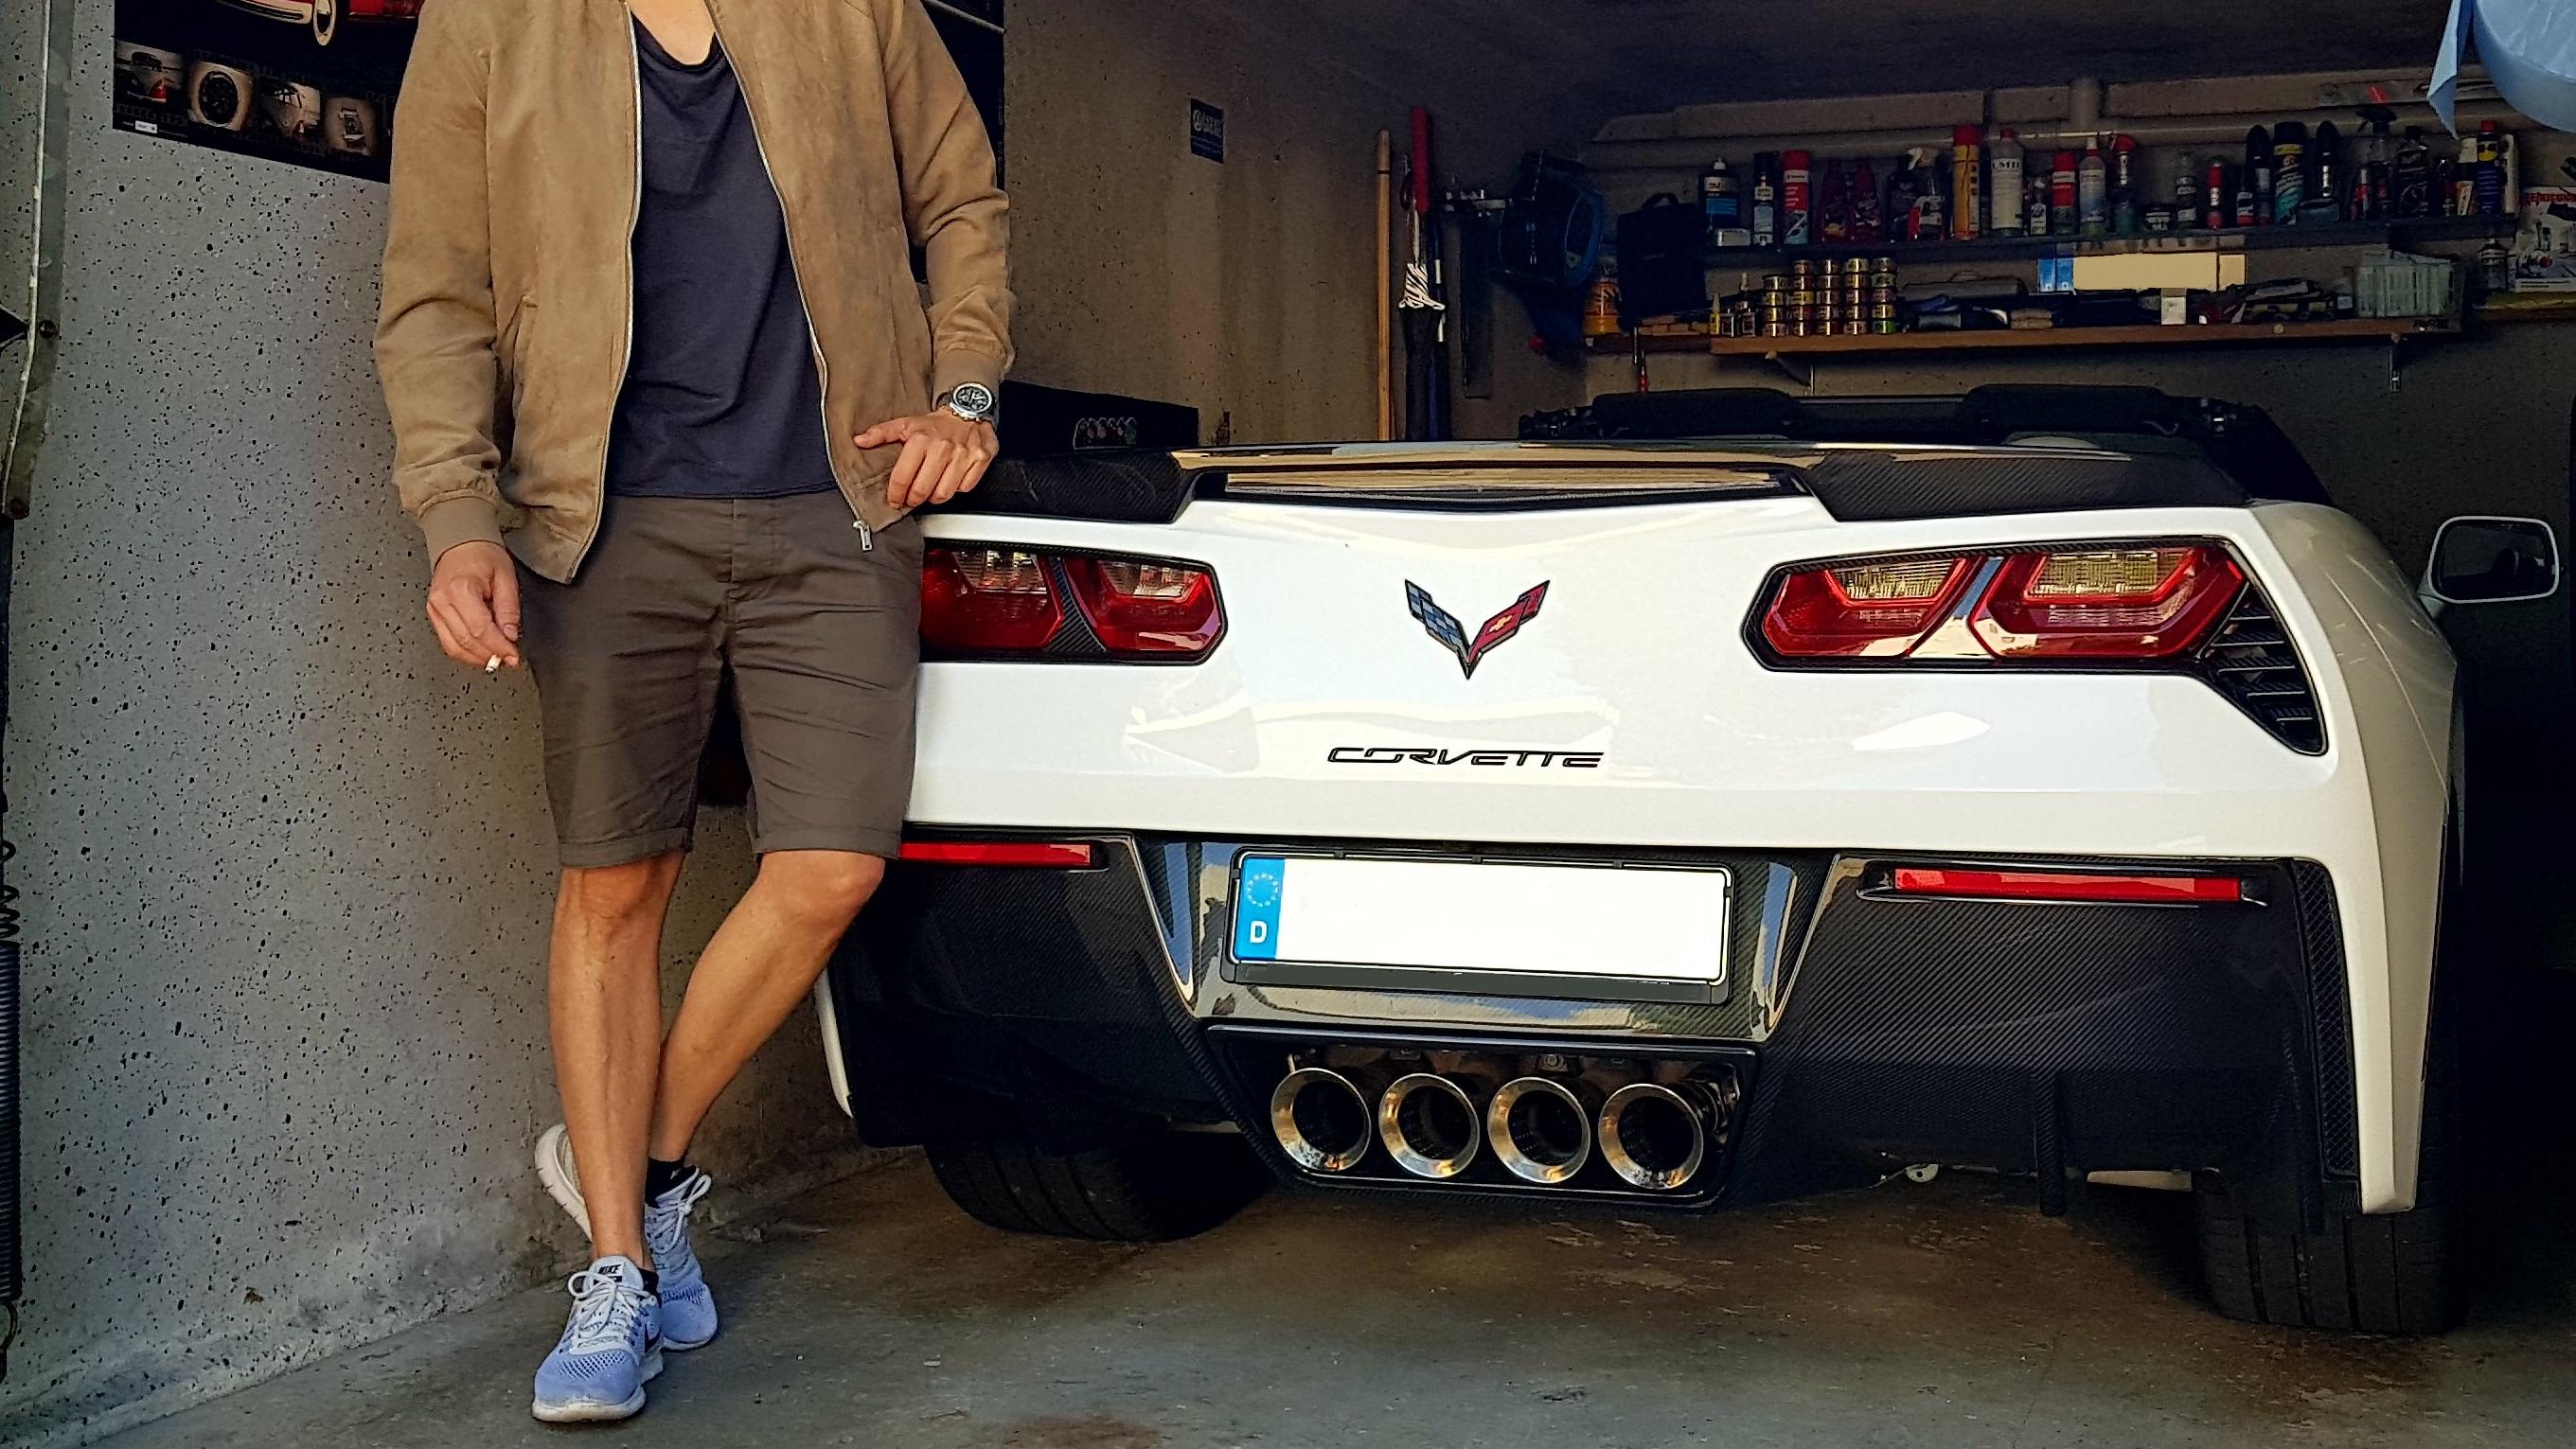 Corvette C7 in die Garage gequetscht